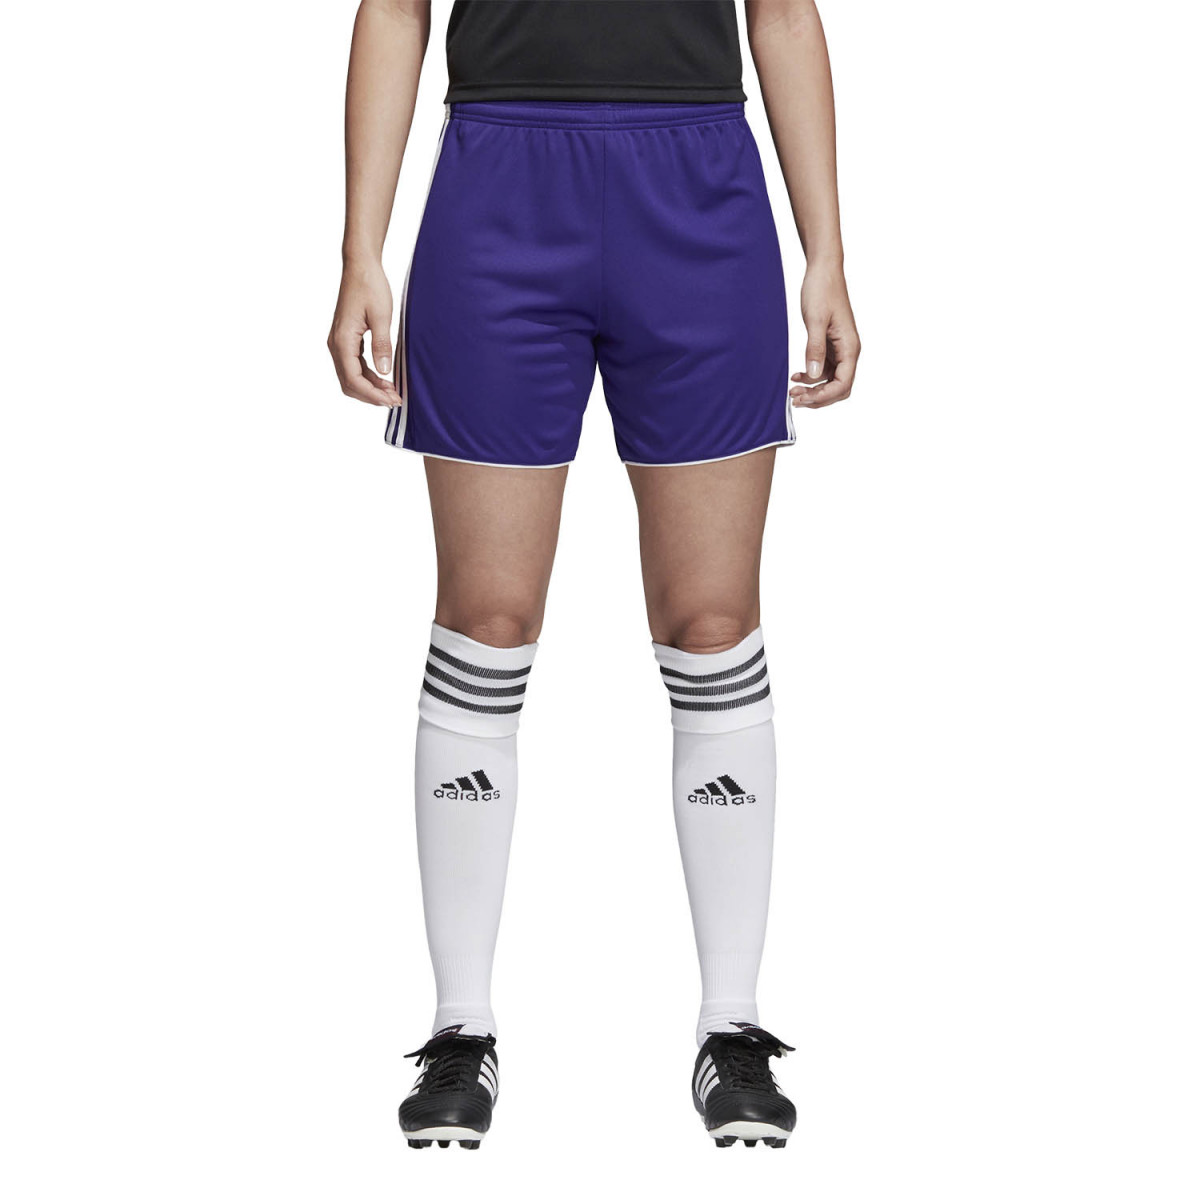 Short Adidas Tastigo 17